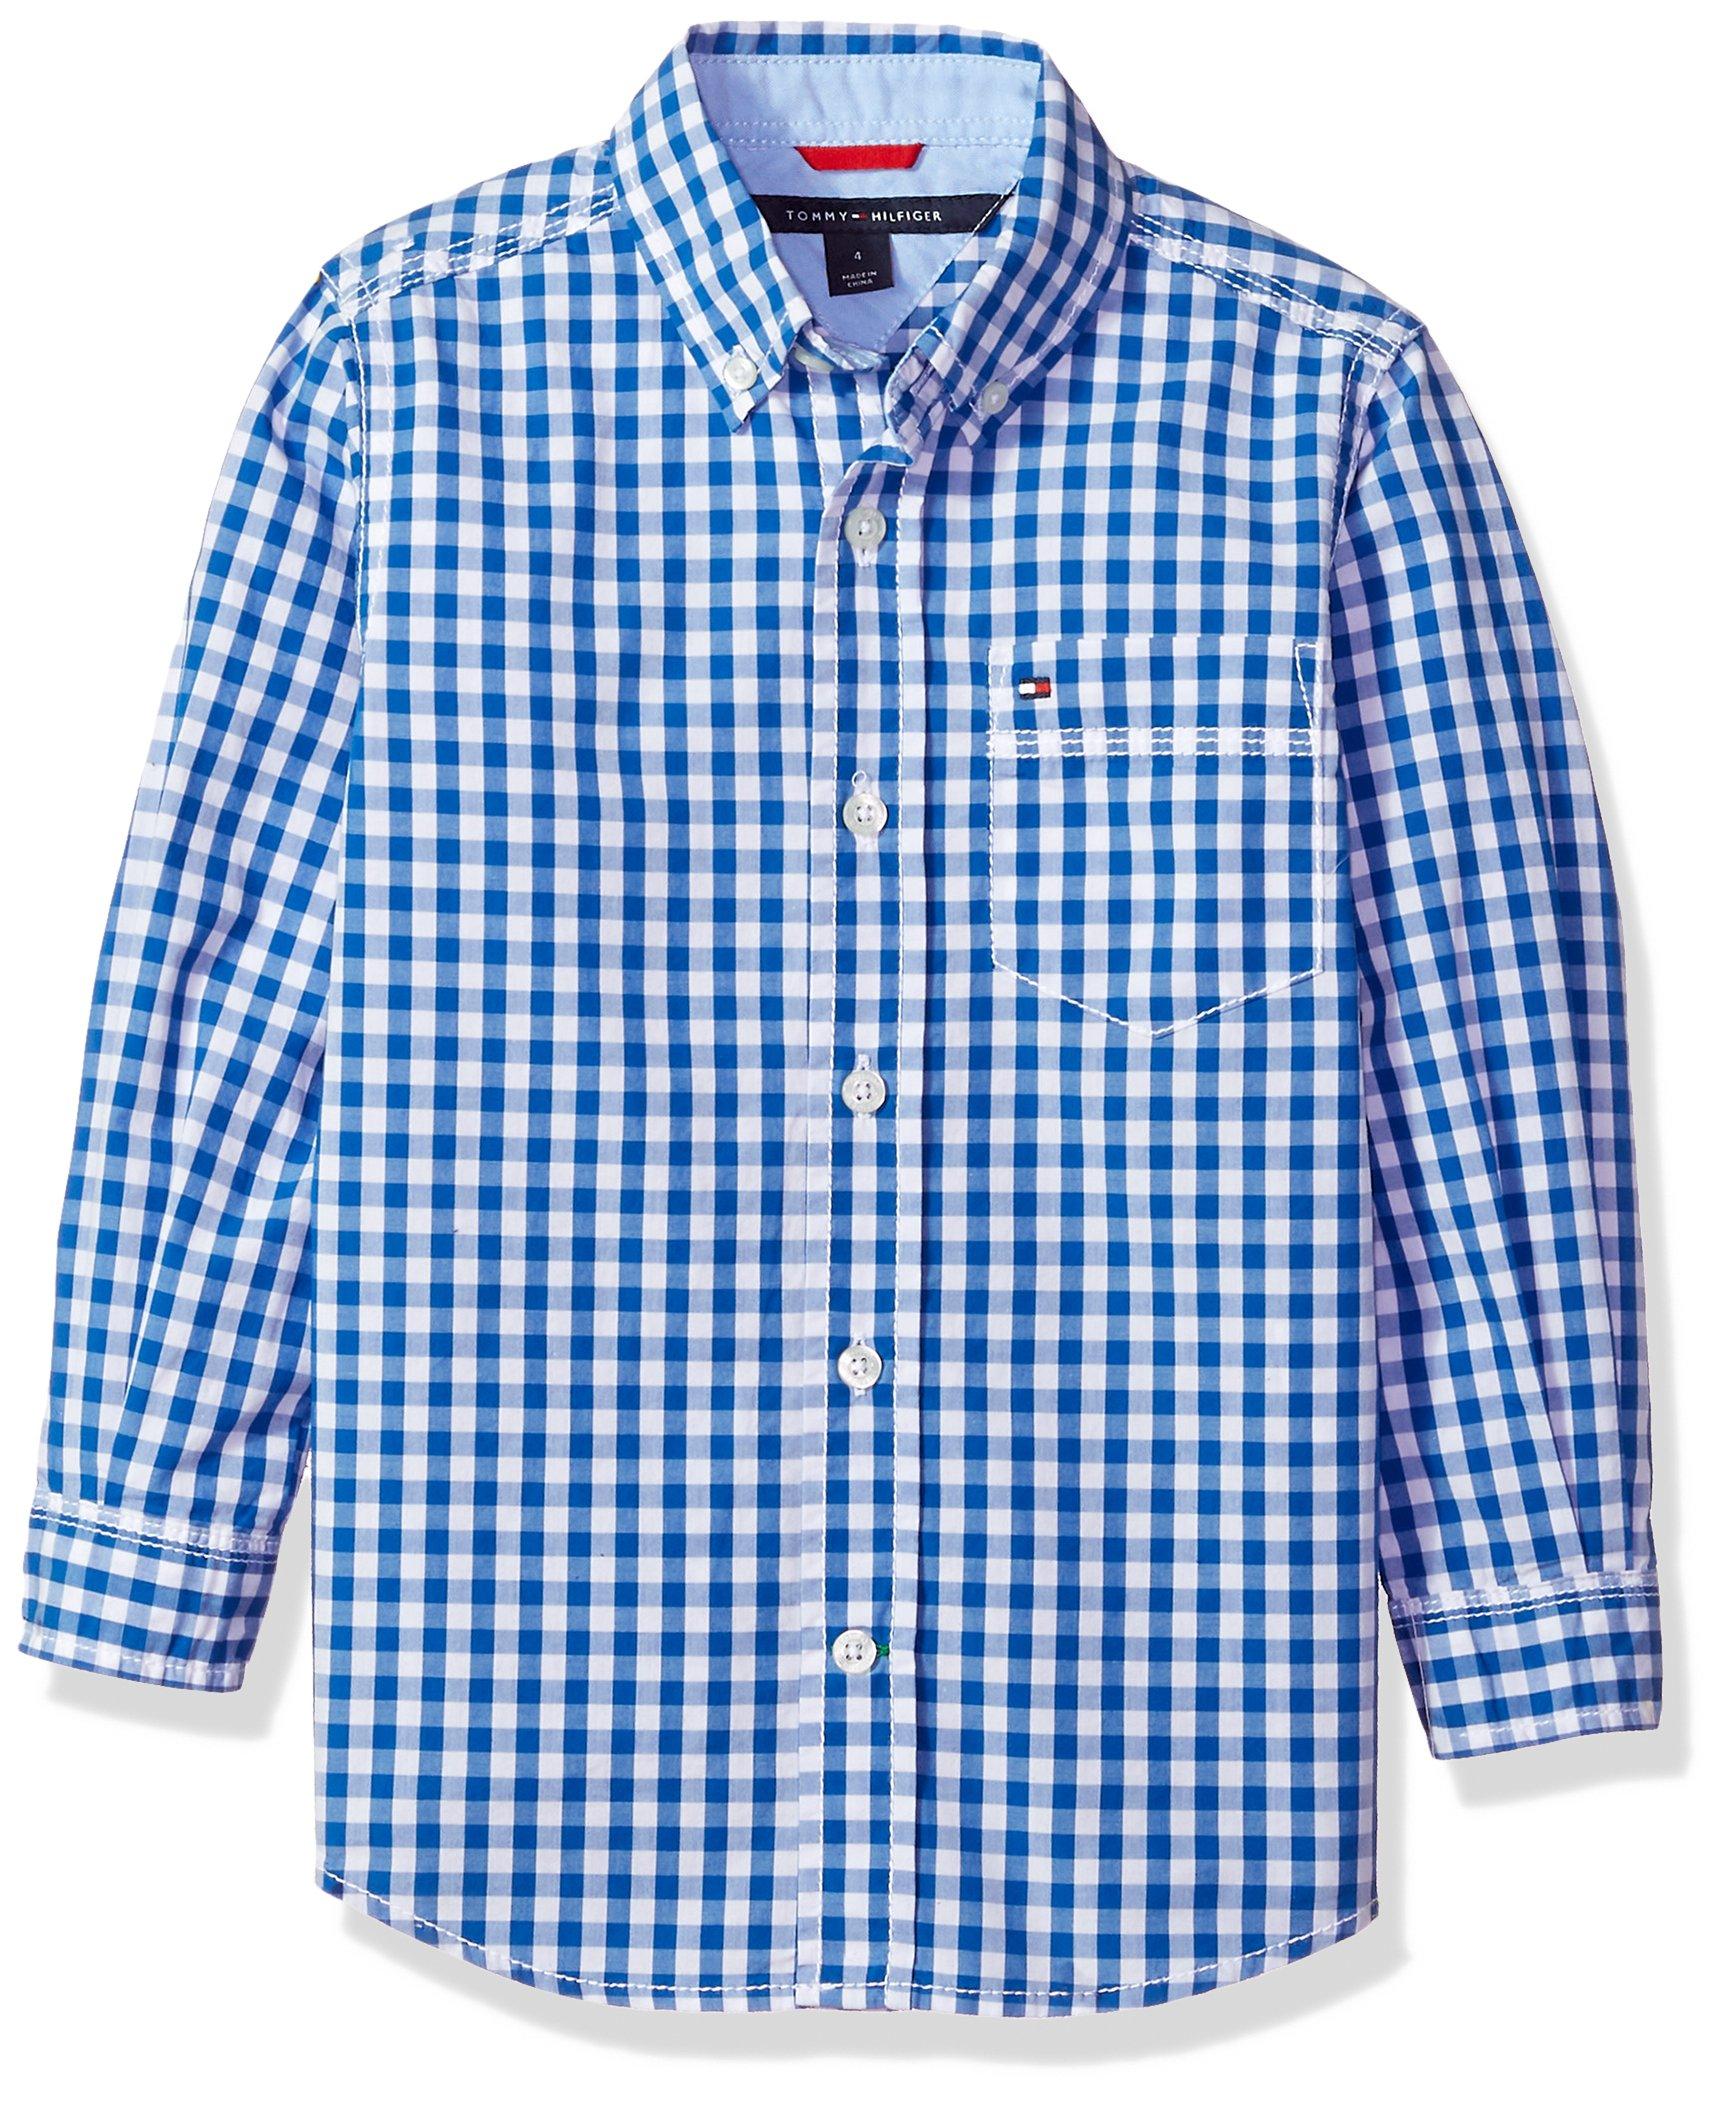 Tommy Hilfiger Big Boys Long Sleeve Baxter Shirt, Blue Jean, S